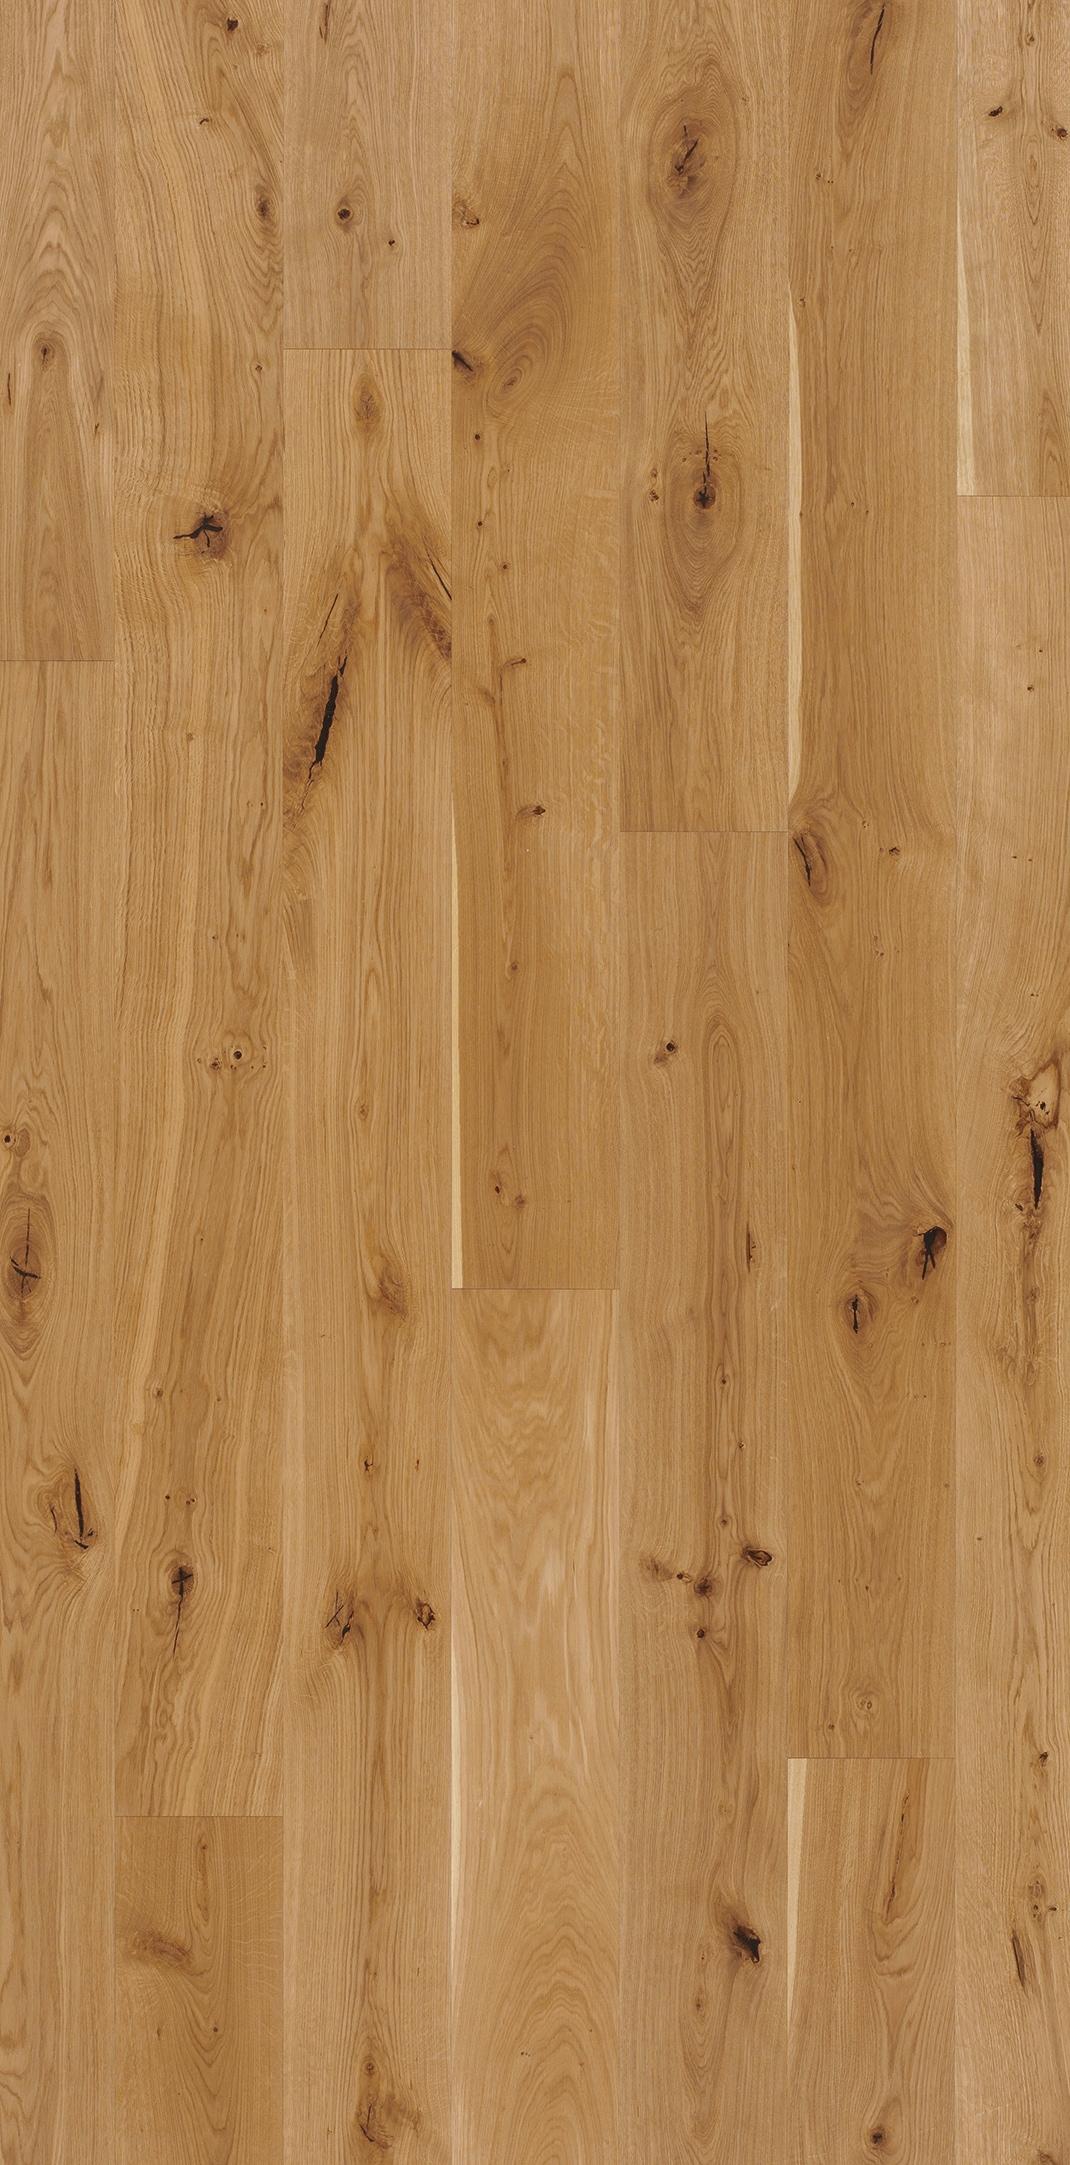 PARADOR Parkett »Eco Balance Rustikal - Eiche gebürstet«, 2200 x 185 mm, Stärke: 13 mm, 3, 66 m² | Baumarkt > Bodenbeläge > Parkett | PARADOR